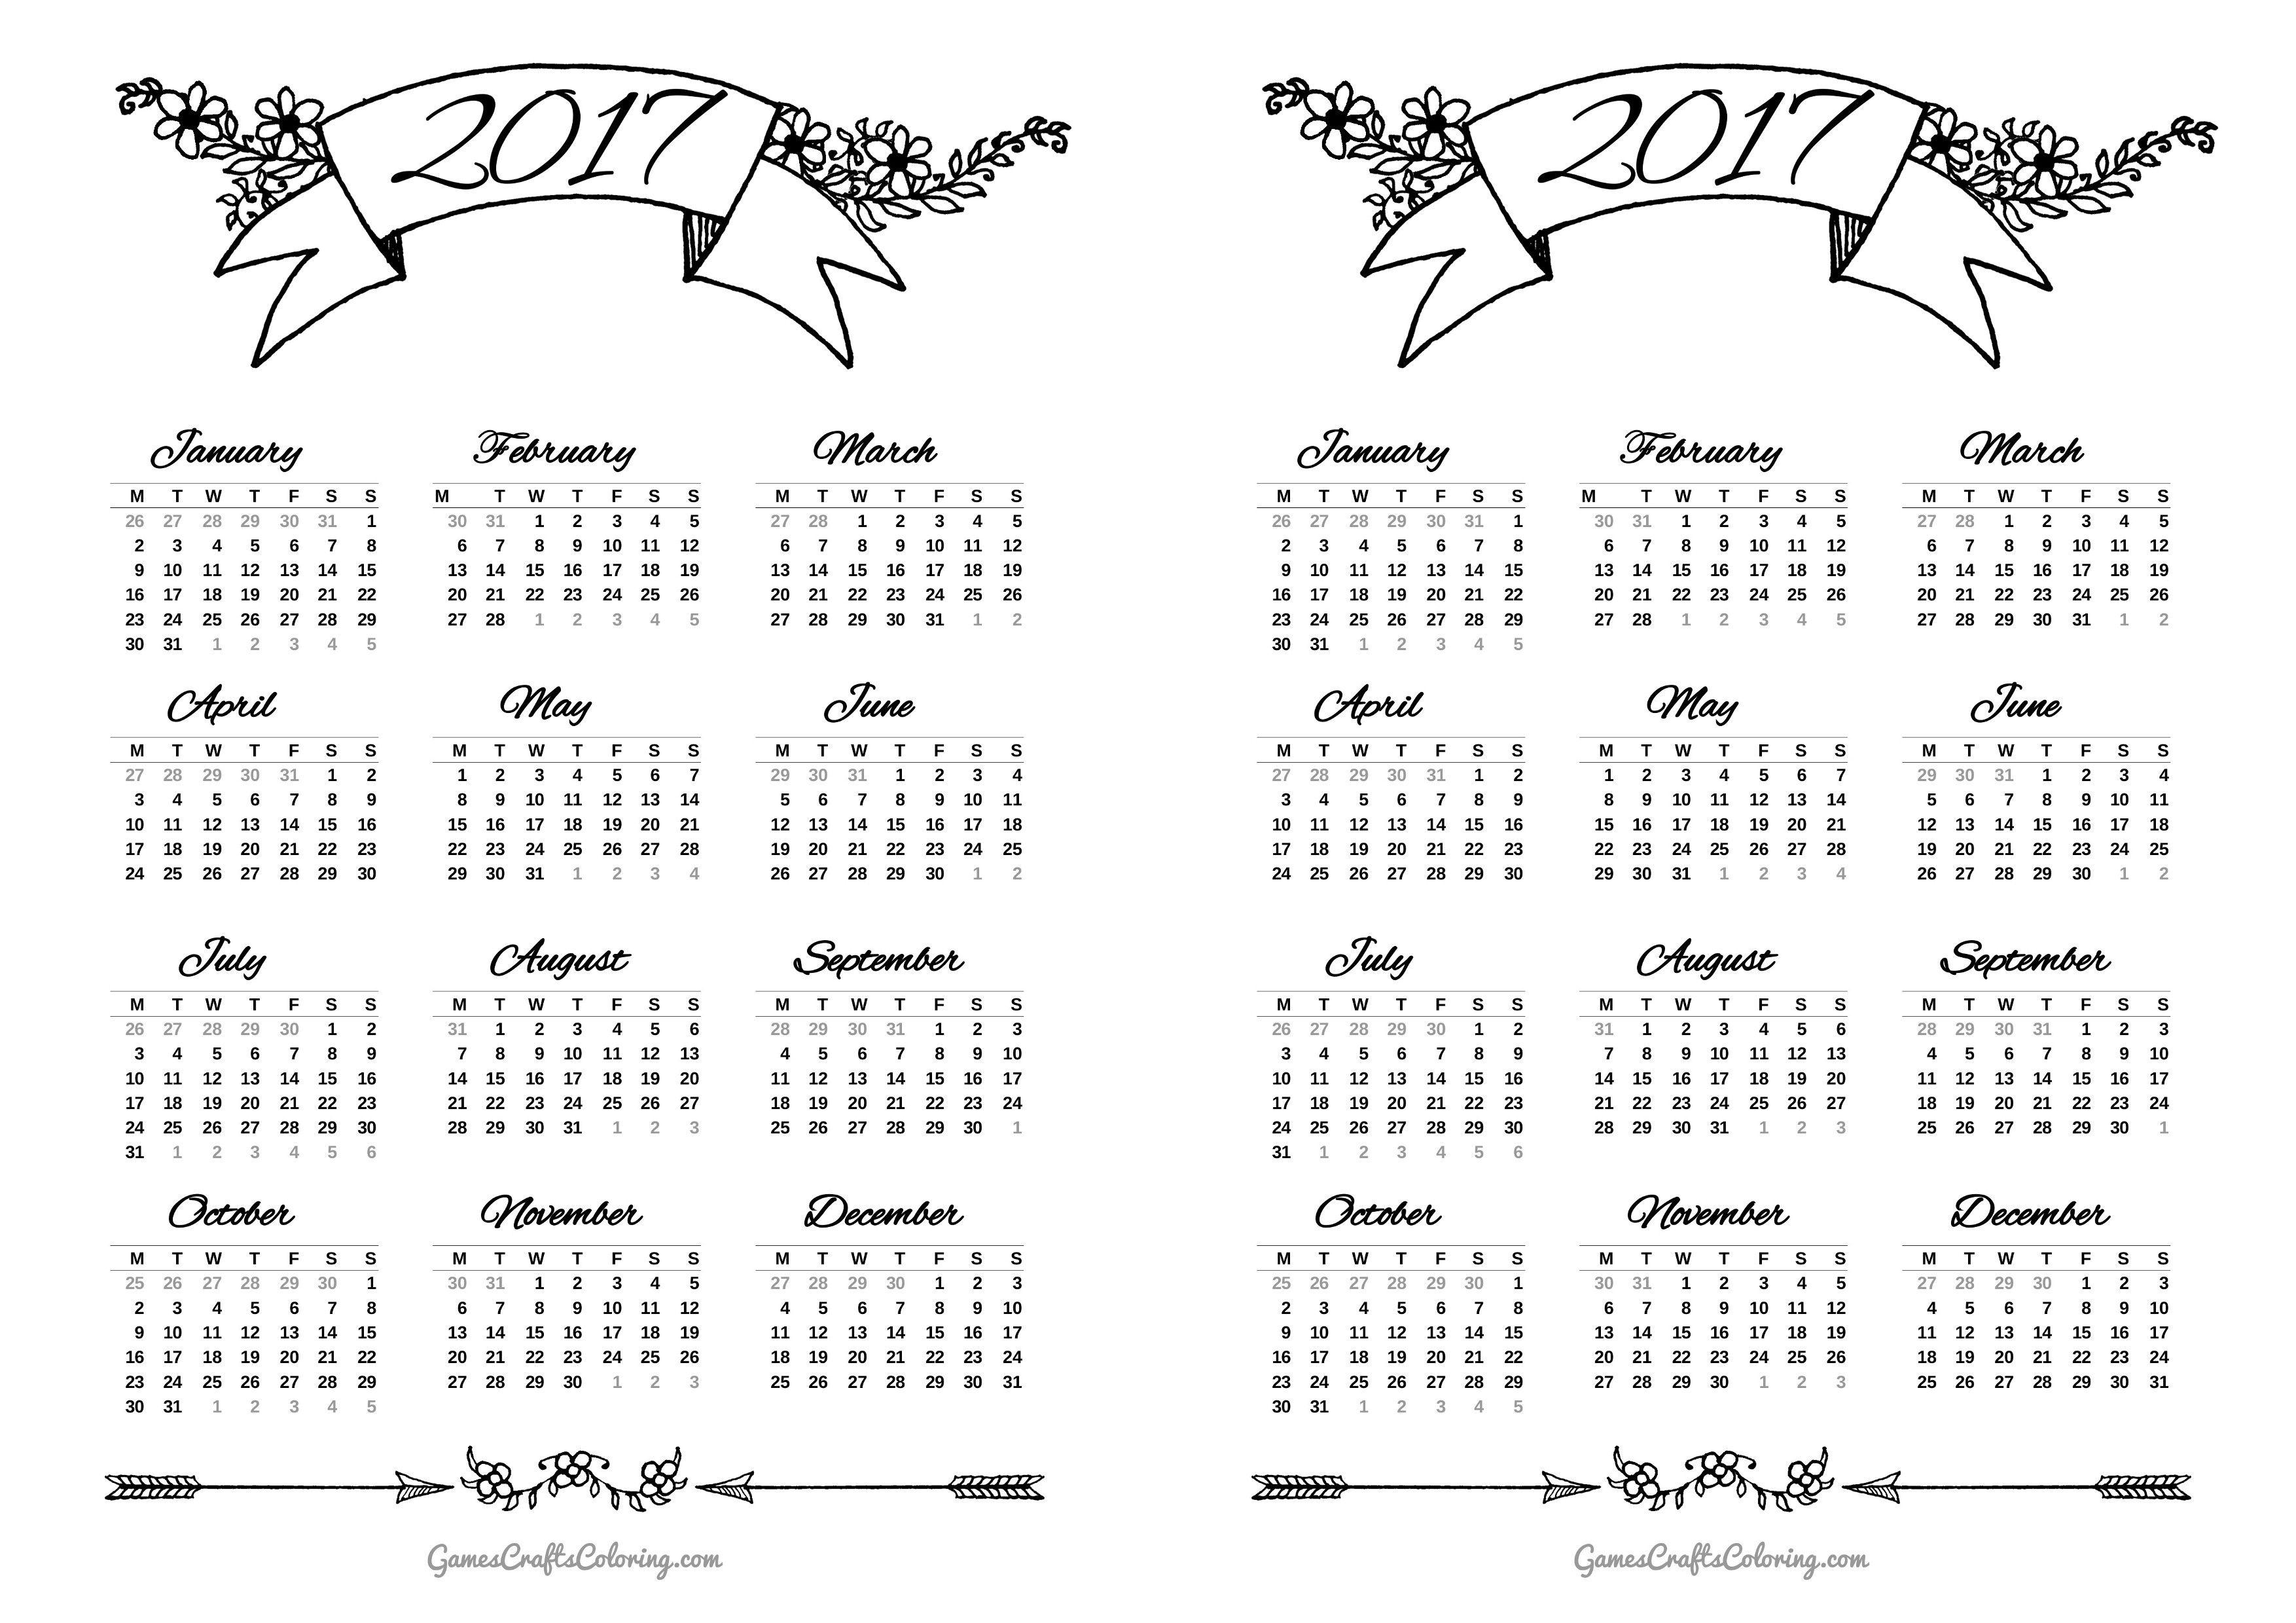 Bullet Journal Printables Calendar : Gcc games crafts coloring bullet journal setup and